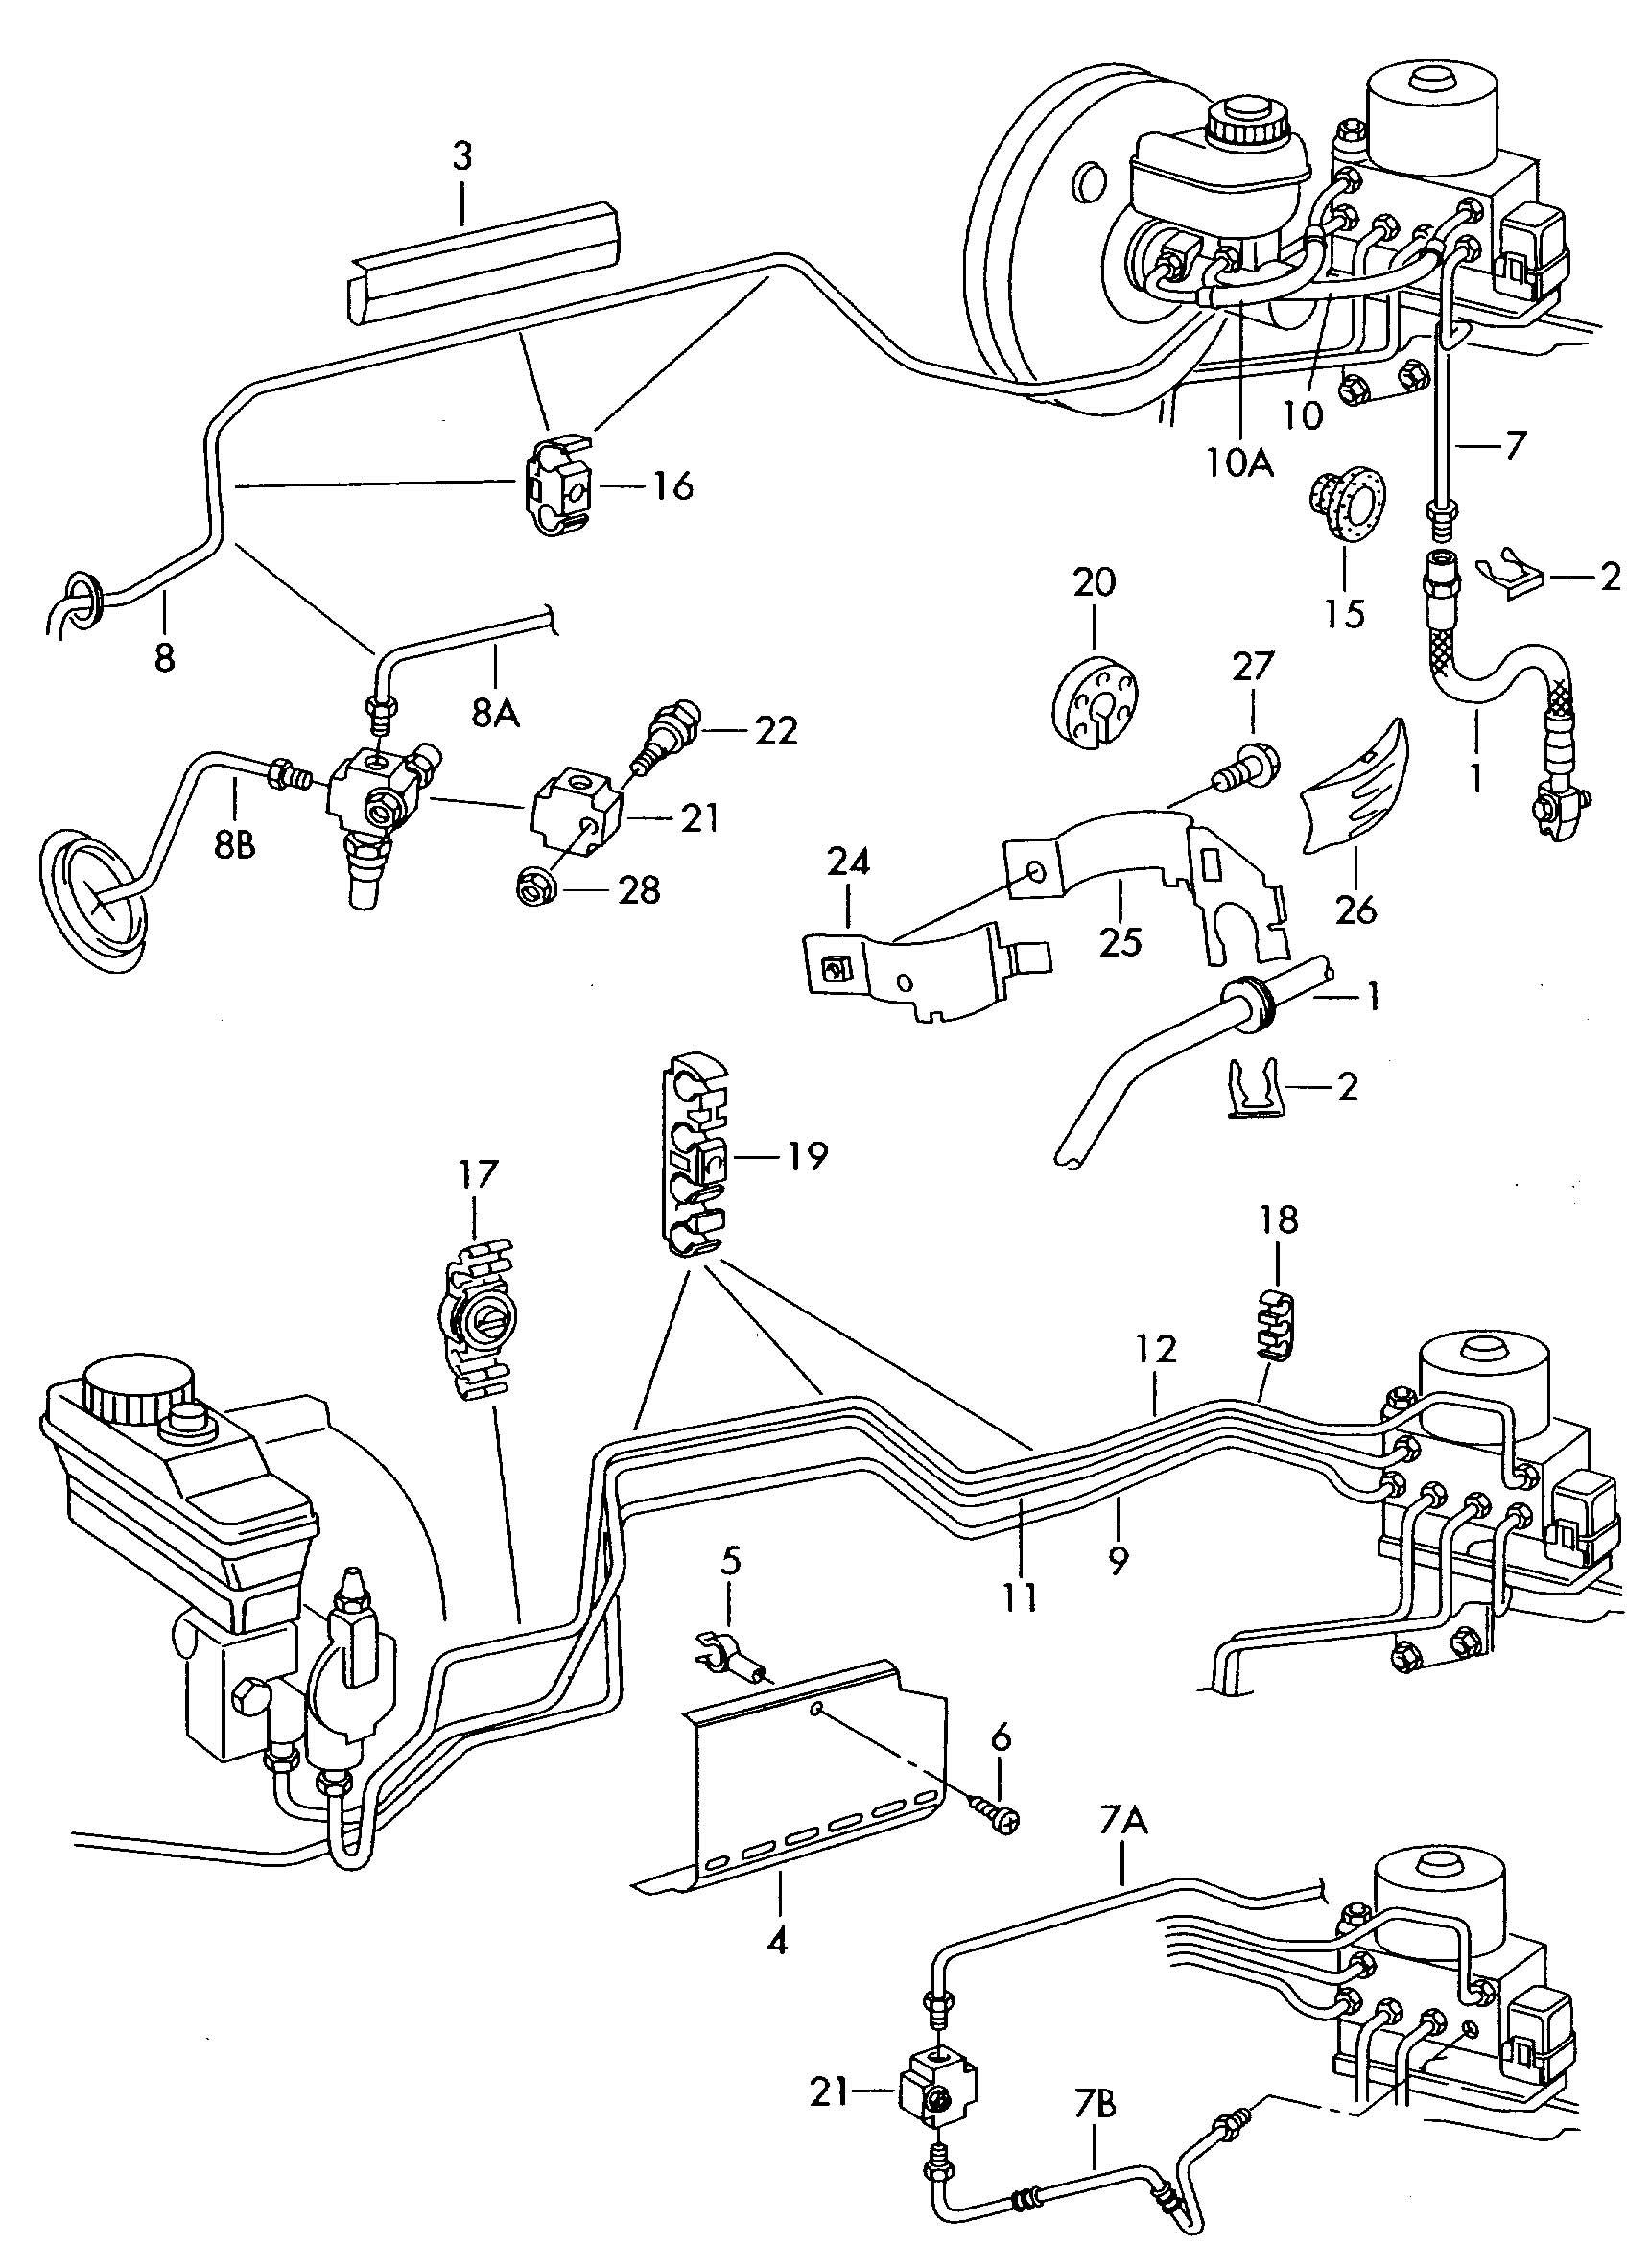 Volkswagen Golf Brake Line From Hydraulic System To Brake